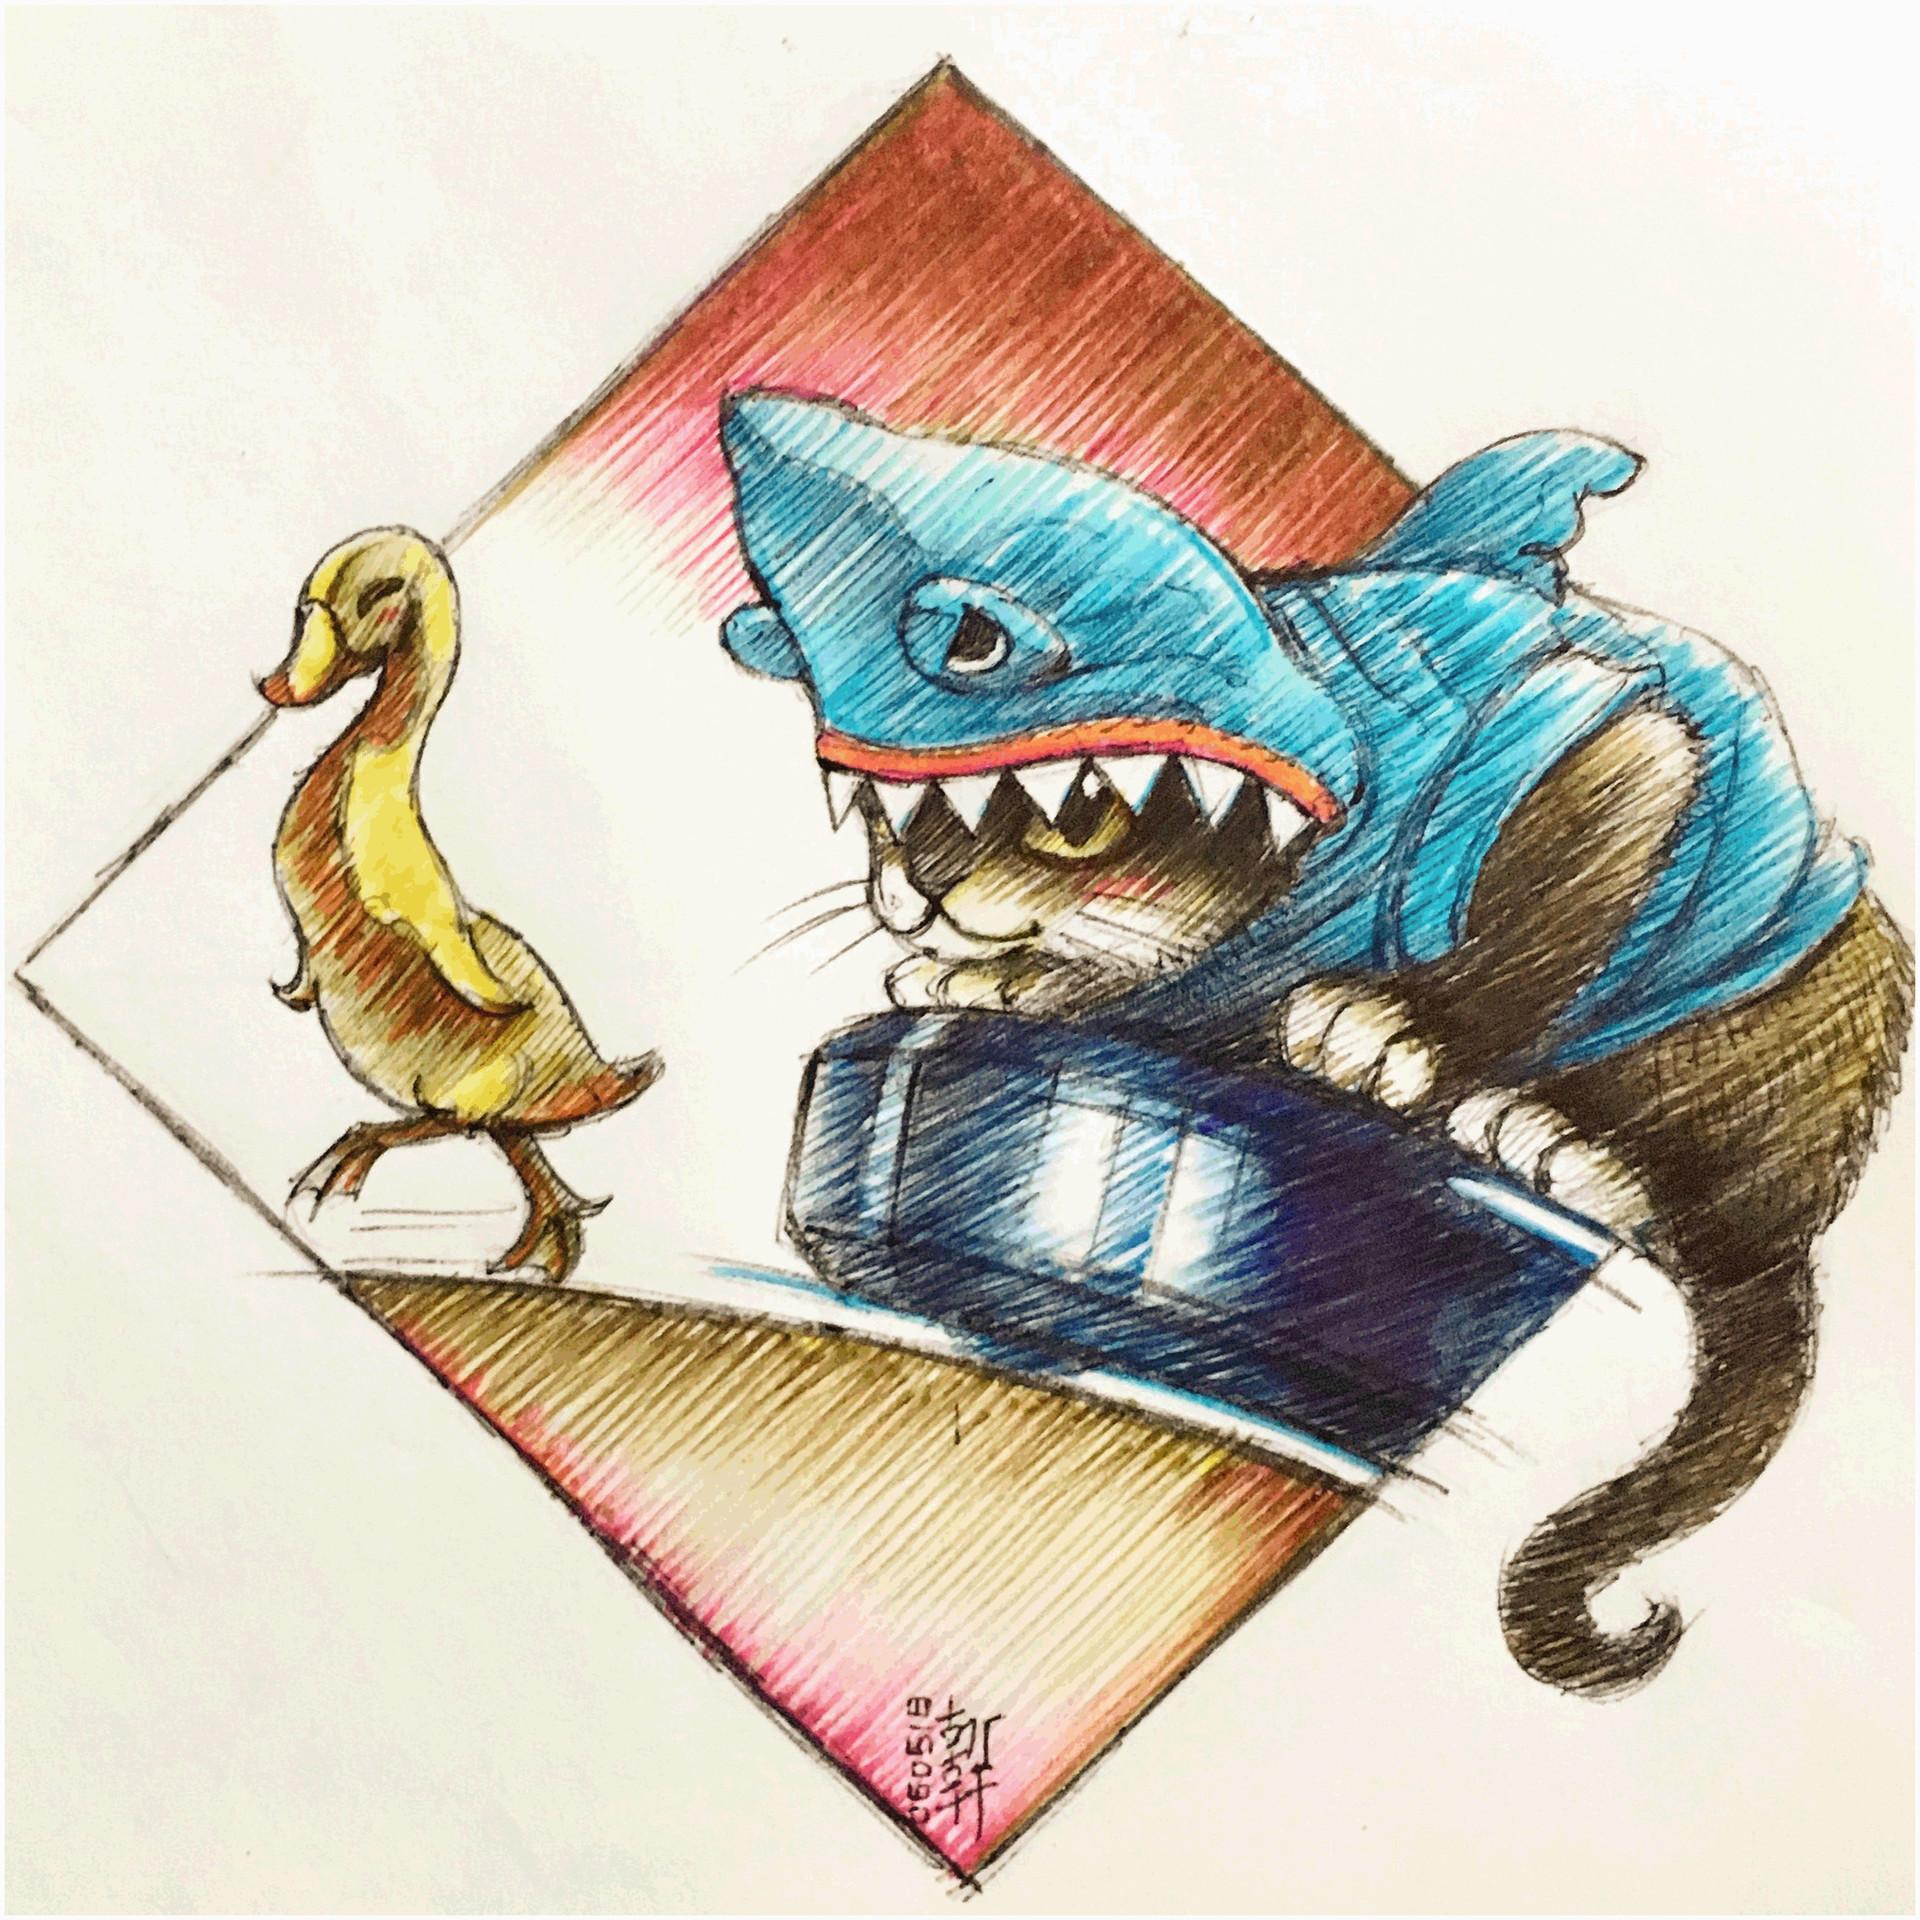 E lynx lin maxroombasharkcat